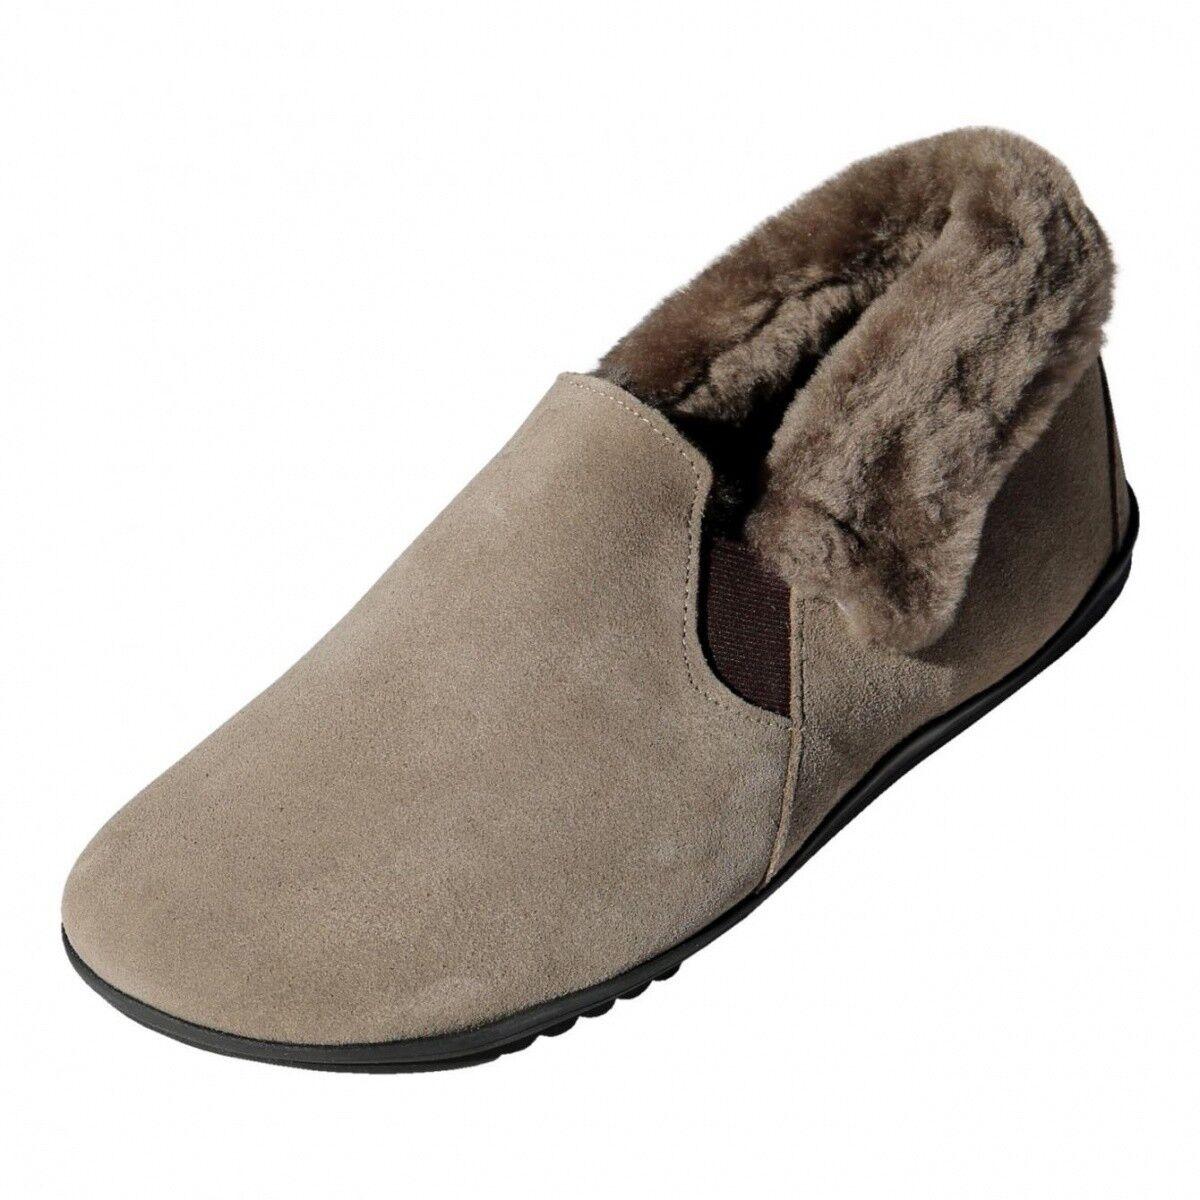 Pantofole in scarpe pelle  di agnello biekamp PEPE scarpe in uomo  pelle  453bdb